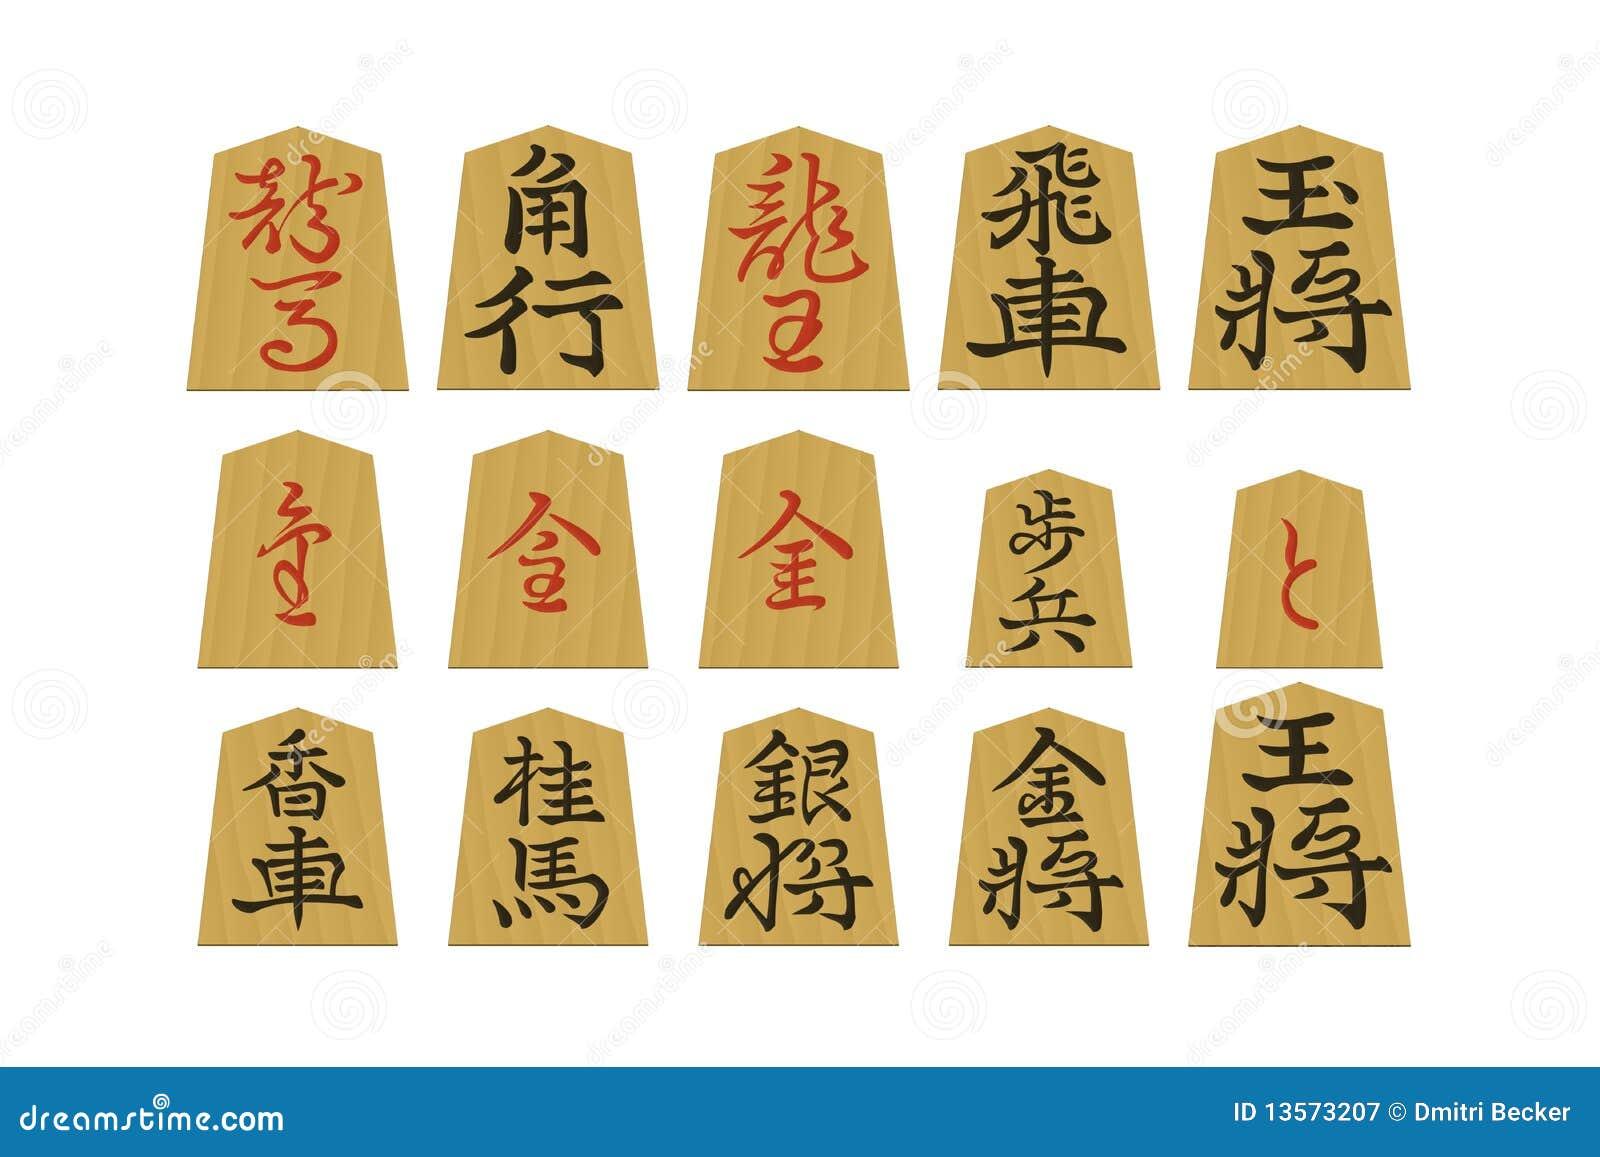 shogi pieces stock illustration illustration of king